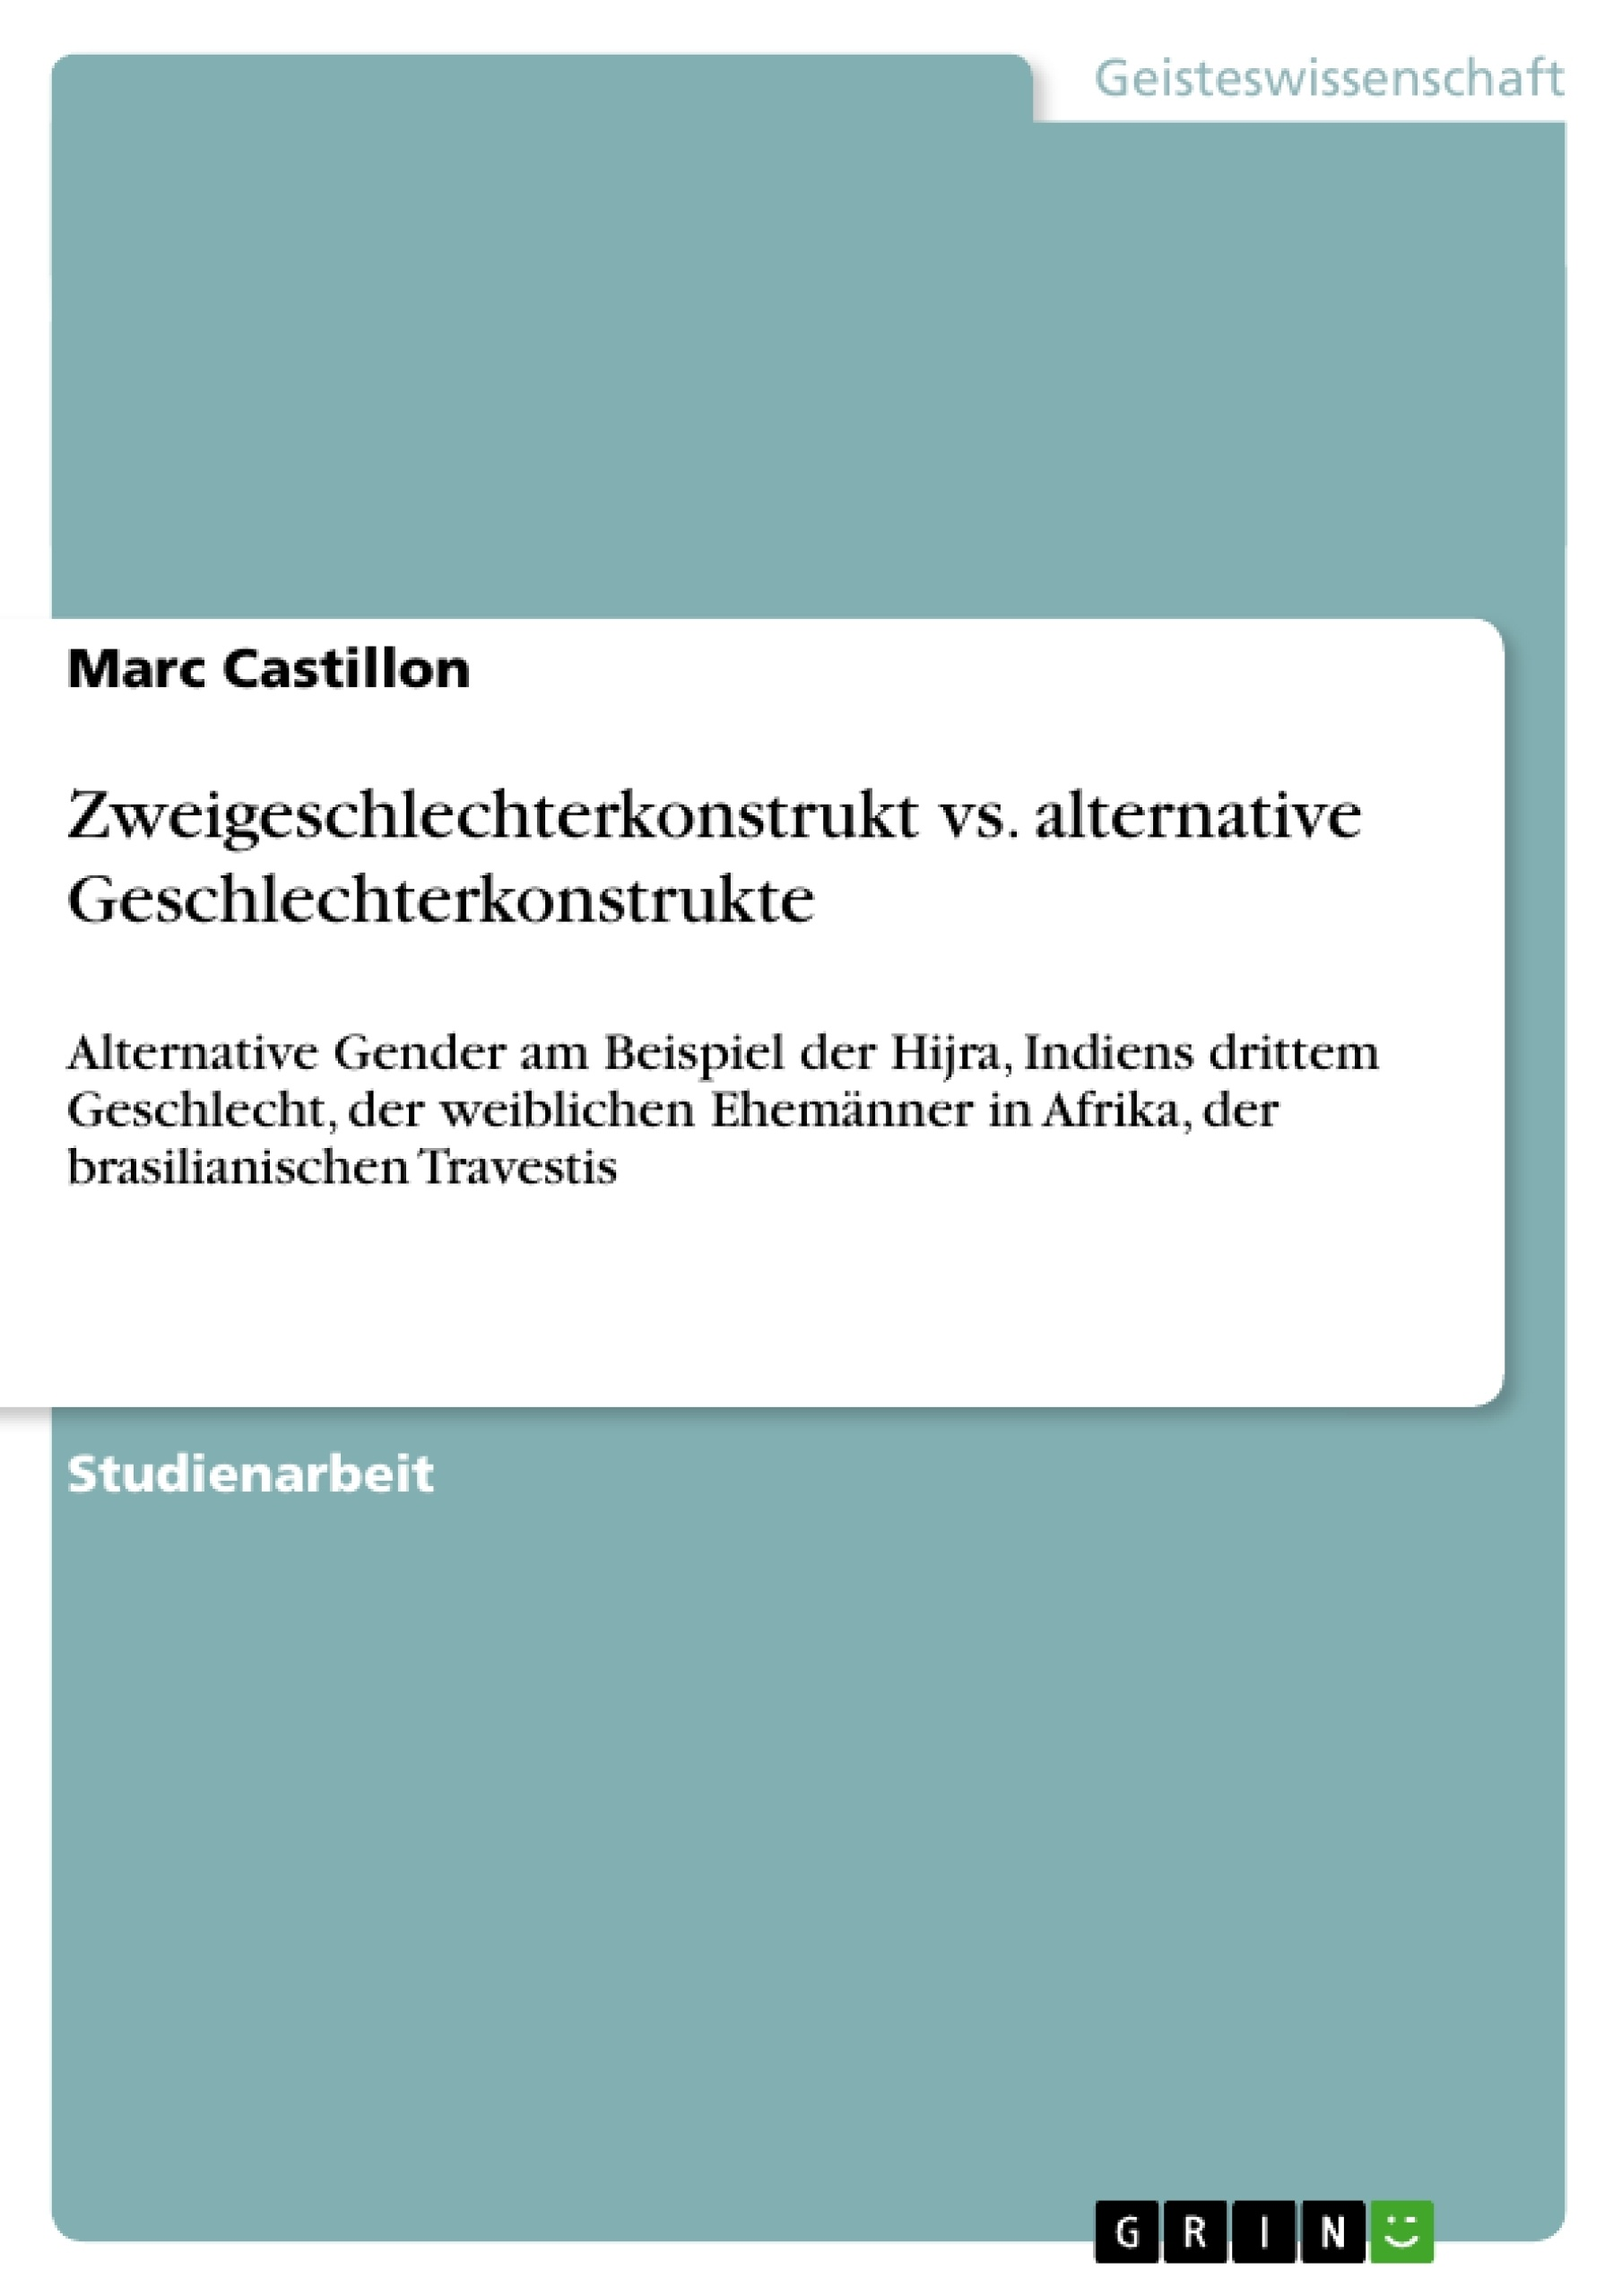 Titel: Zweigeschlechterkonstrukt vs. alternative Geschlechterkonstrukte